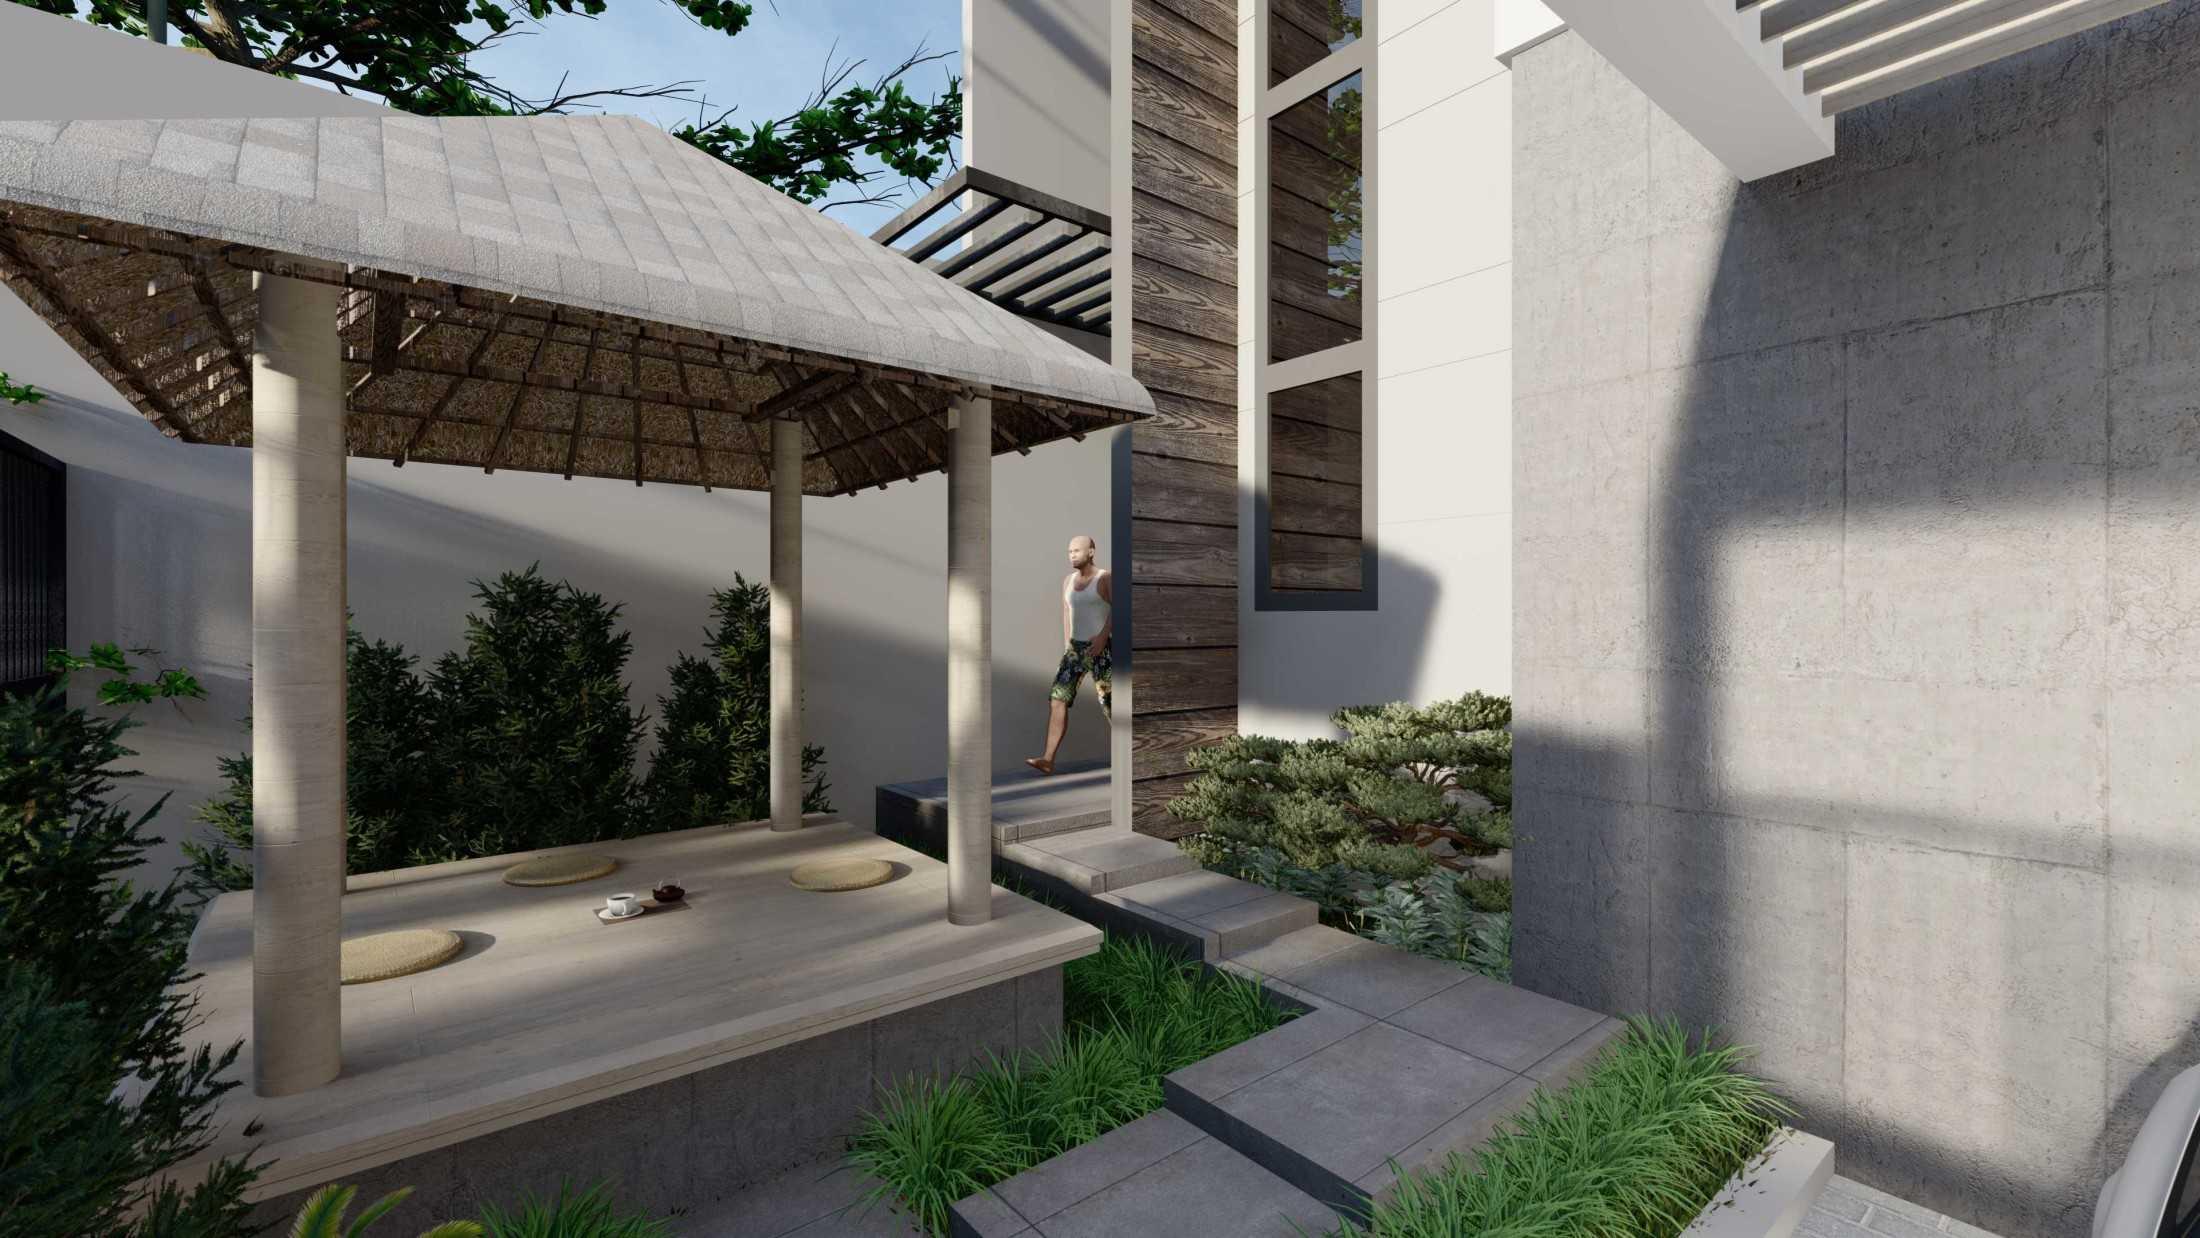 Raaj Gill Arsitek Joglo House Depok, Kota Depok, Jawa Barat, Indonesia Depok, Kota Depok, Jawa Barat, Indonesia Raaj-Gill-Arsitek-Joglo-House  74833